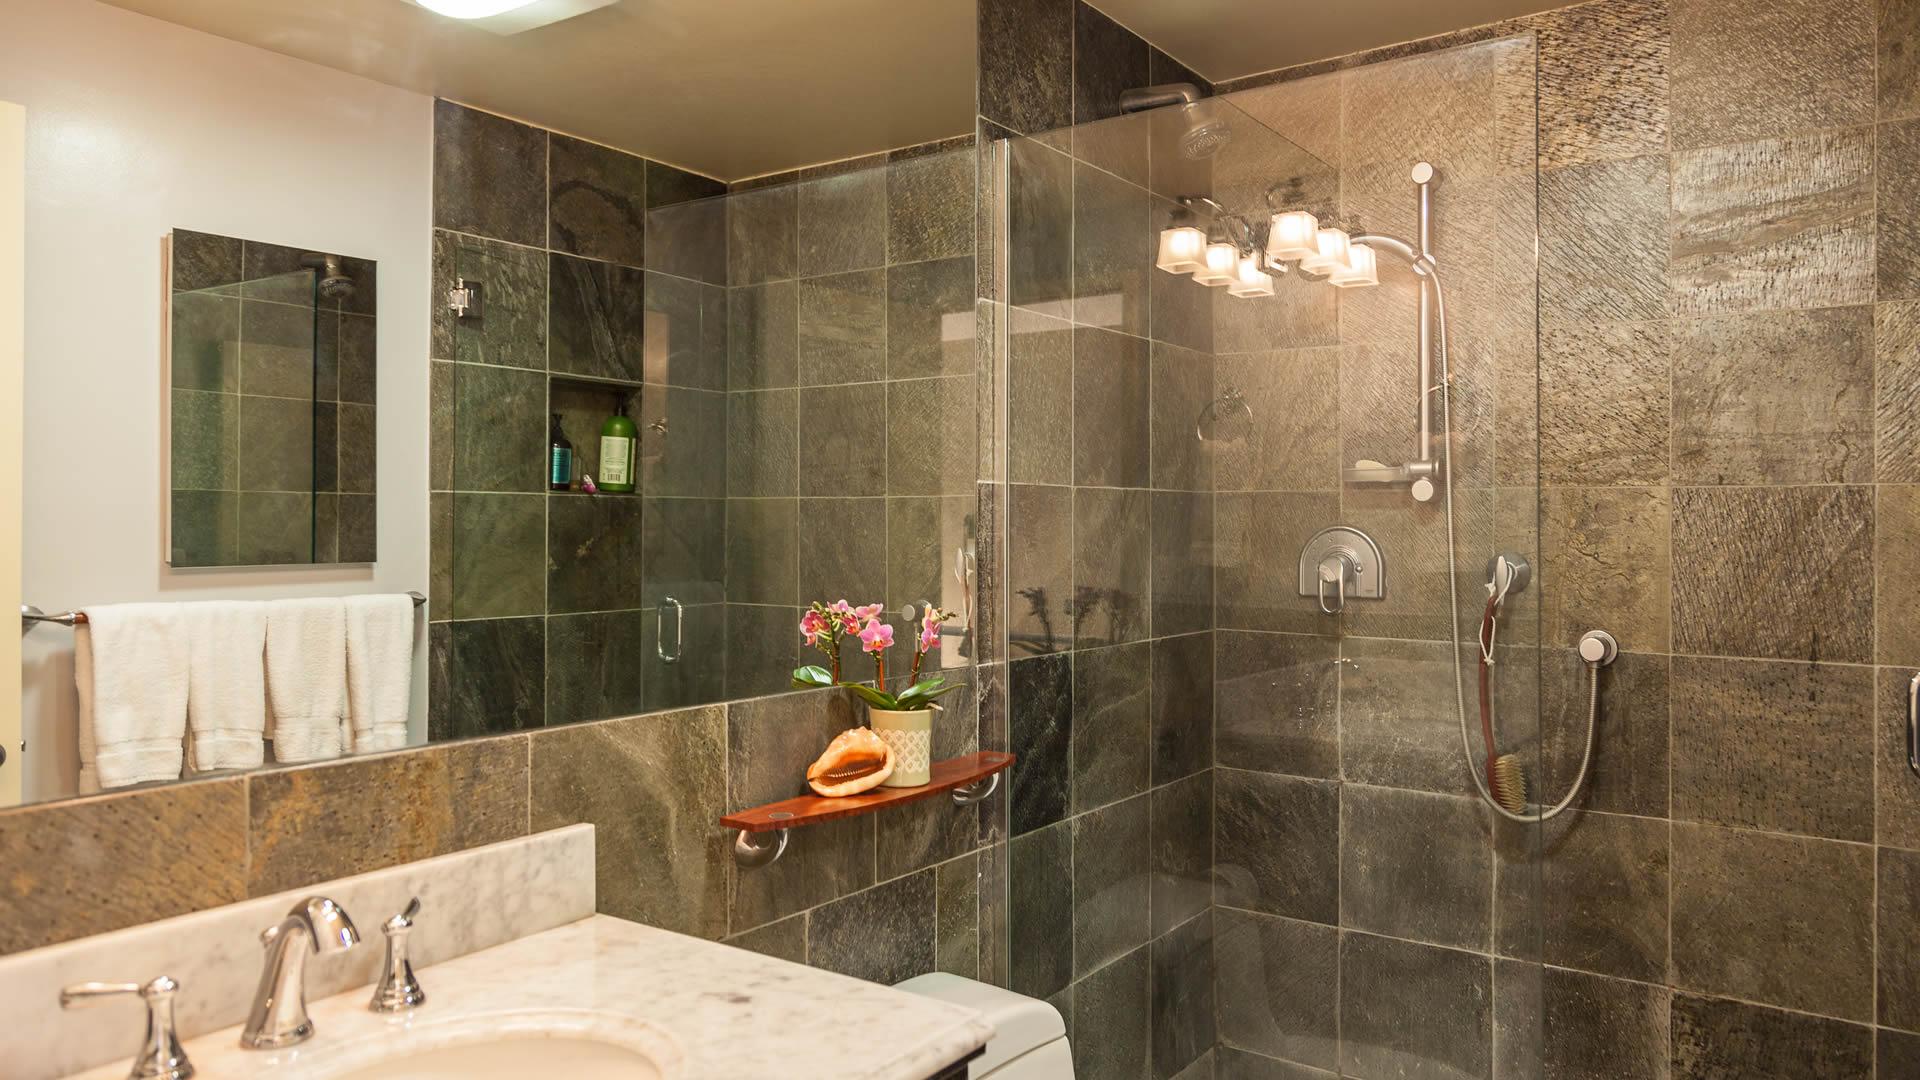 Amazing Kitchen & Bathroom Remodeling Photos - Austin TX